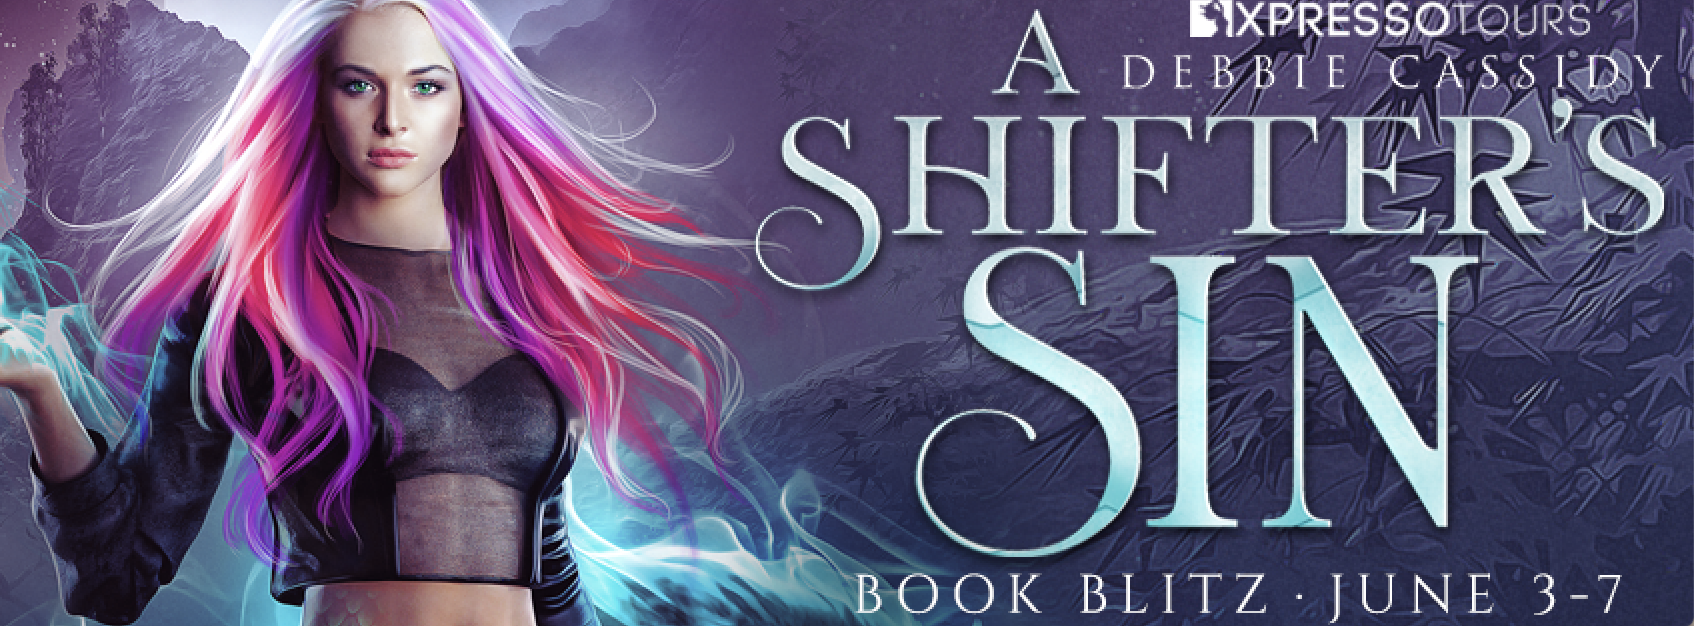 A Shifter's Sin [Book Blitz]